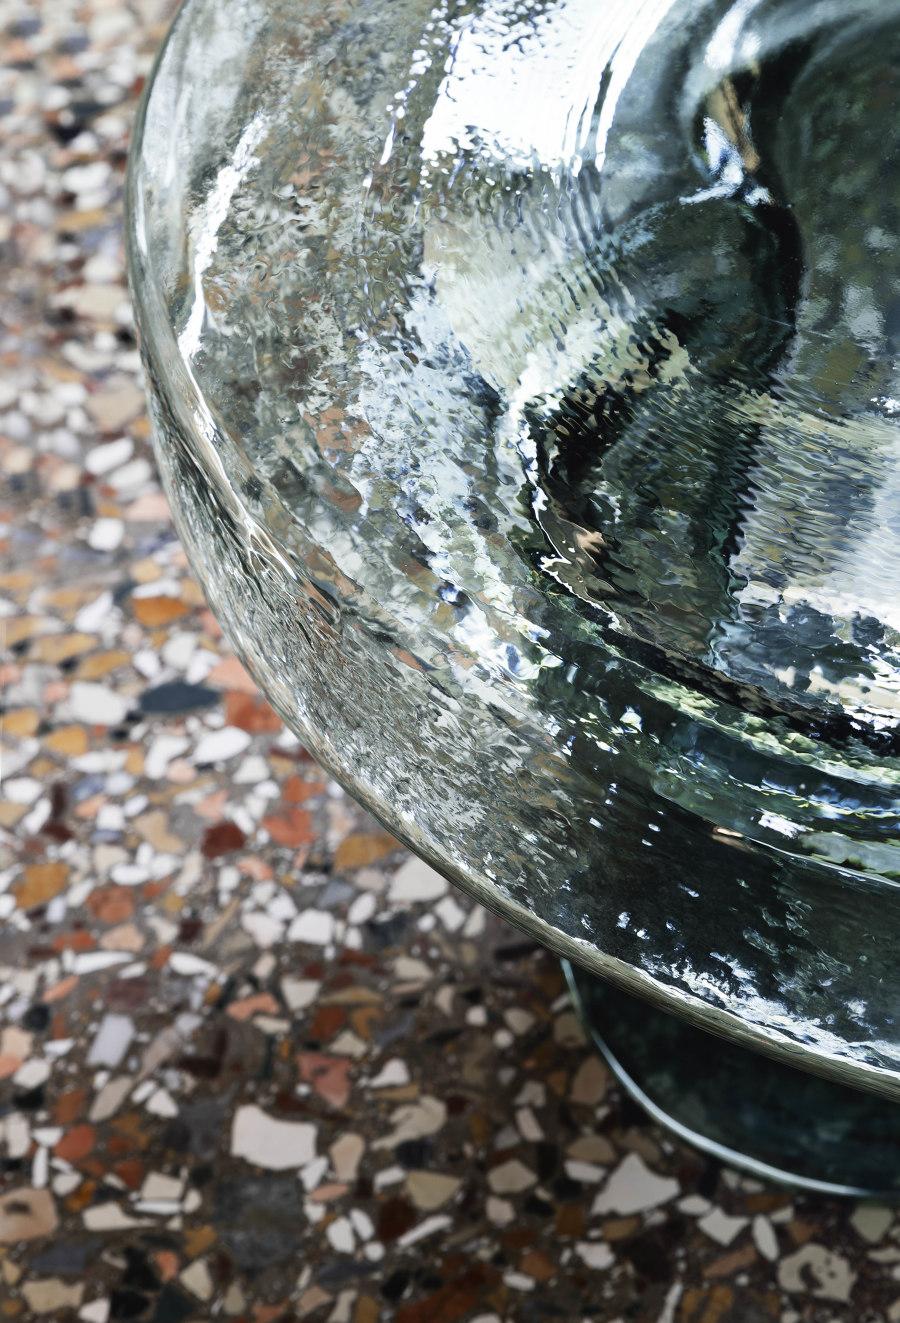 Heart of glass: Soda from miniforms | News